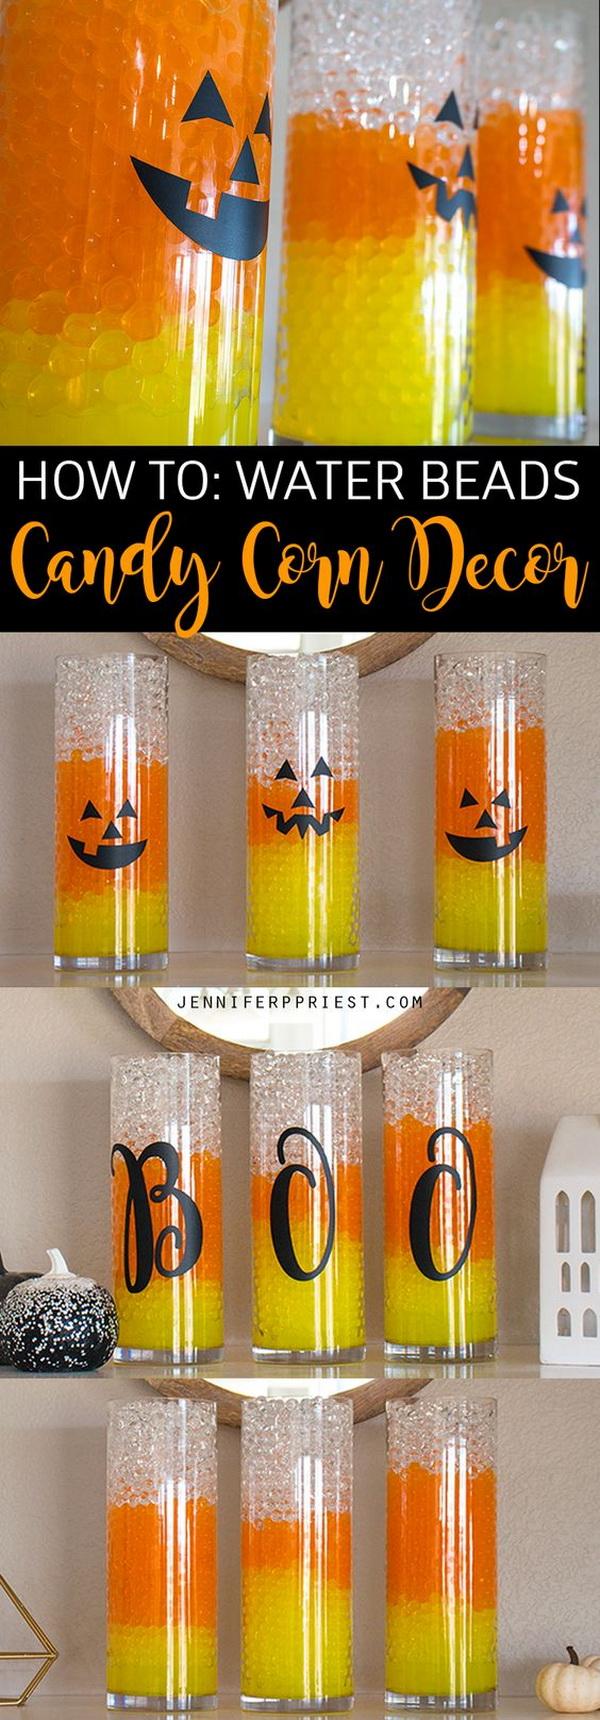 DIY Candy Corn Halloween Water Beads Vases.